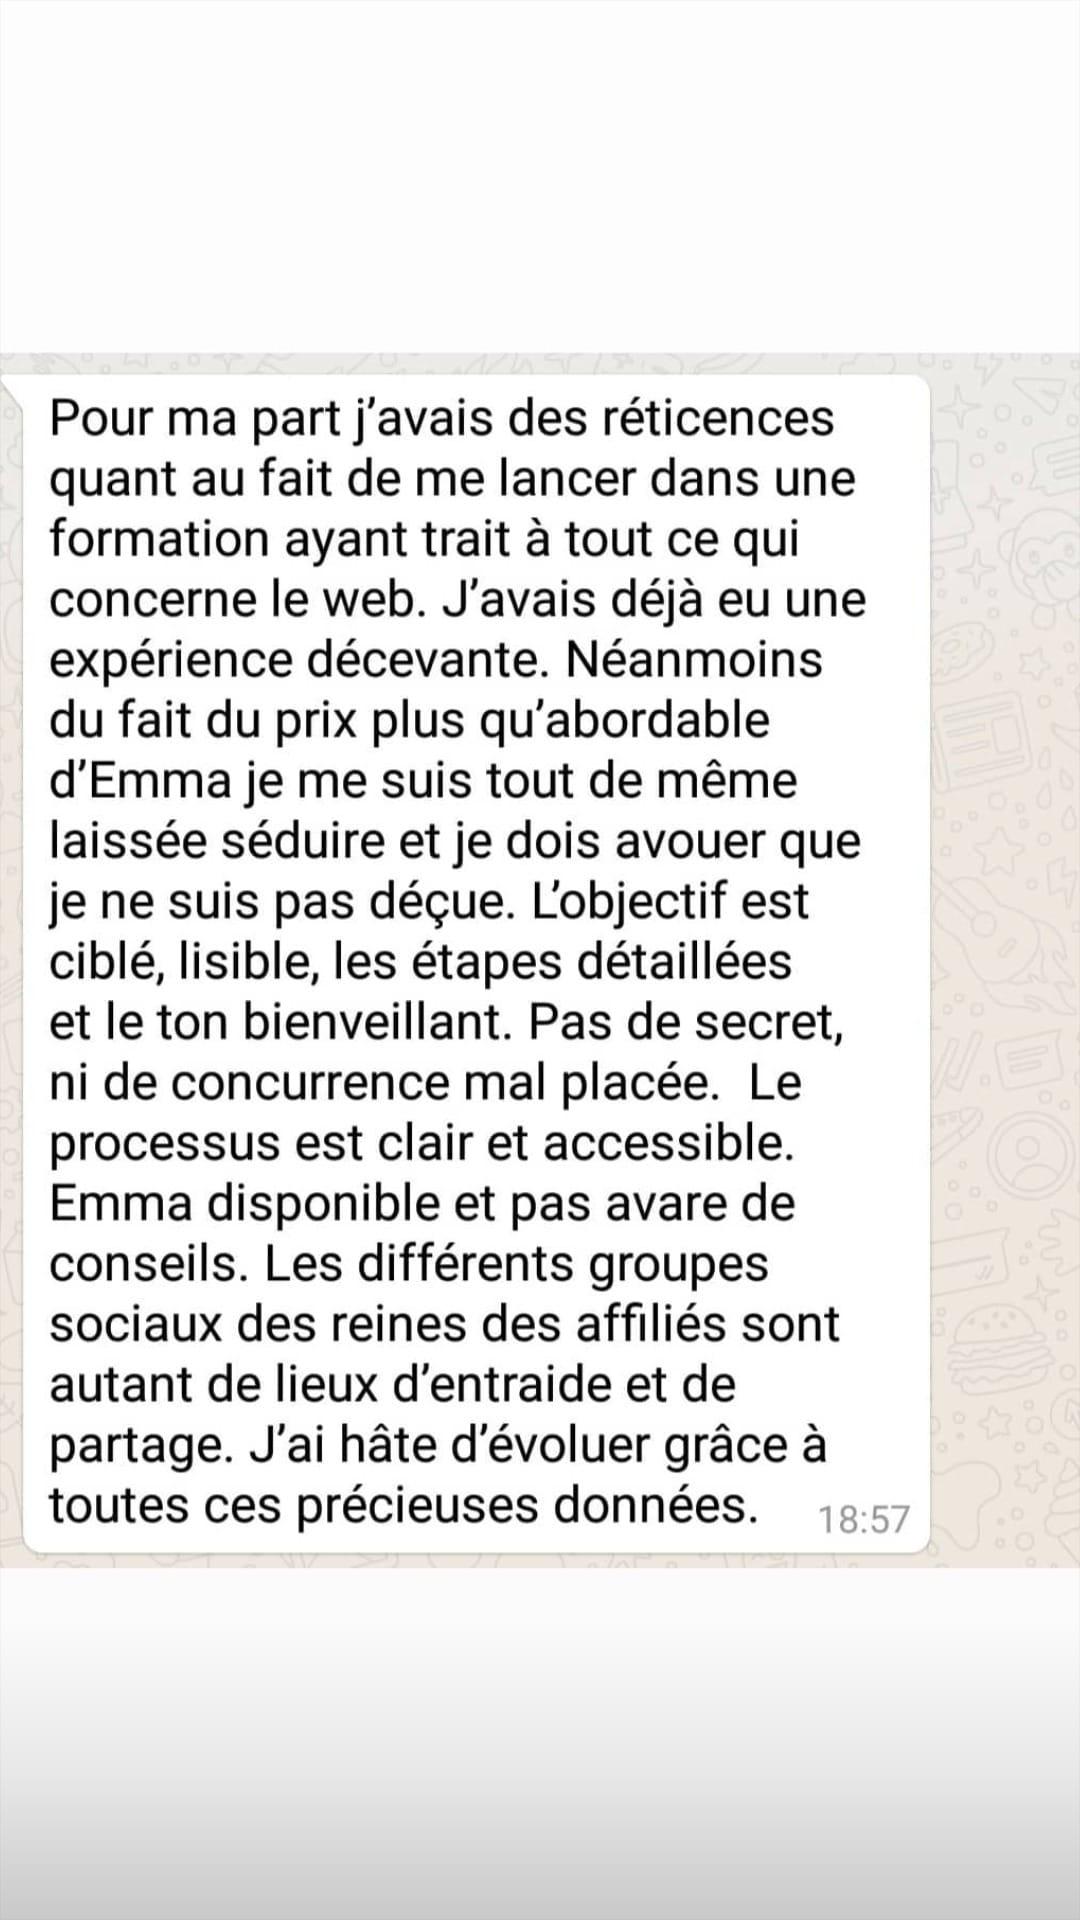 Avis-Les-Reines-Affiliation_20200605_084501